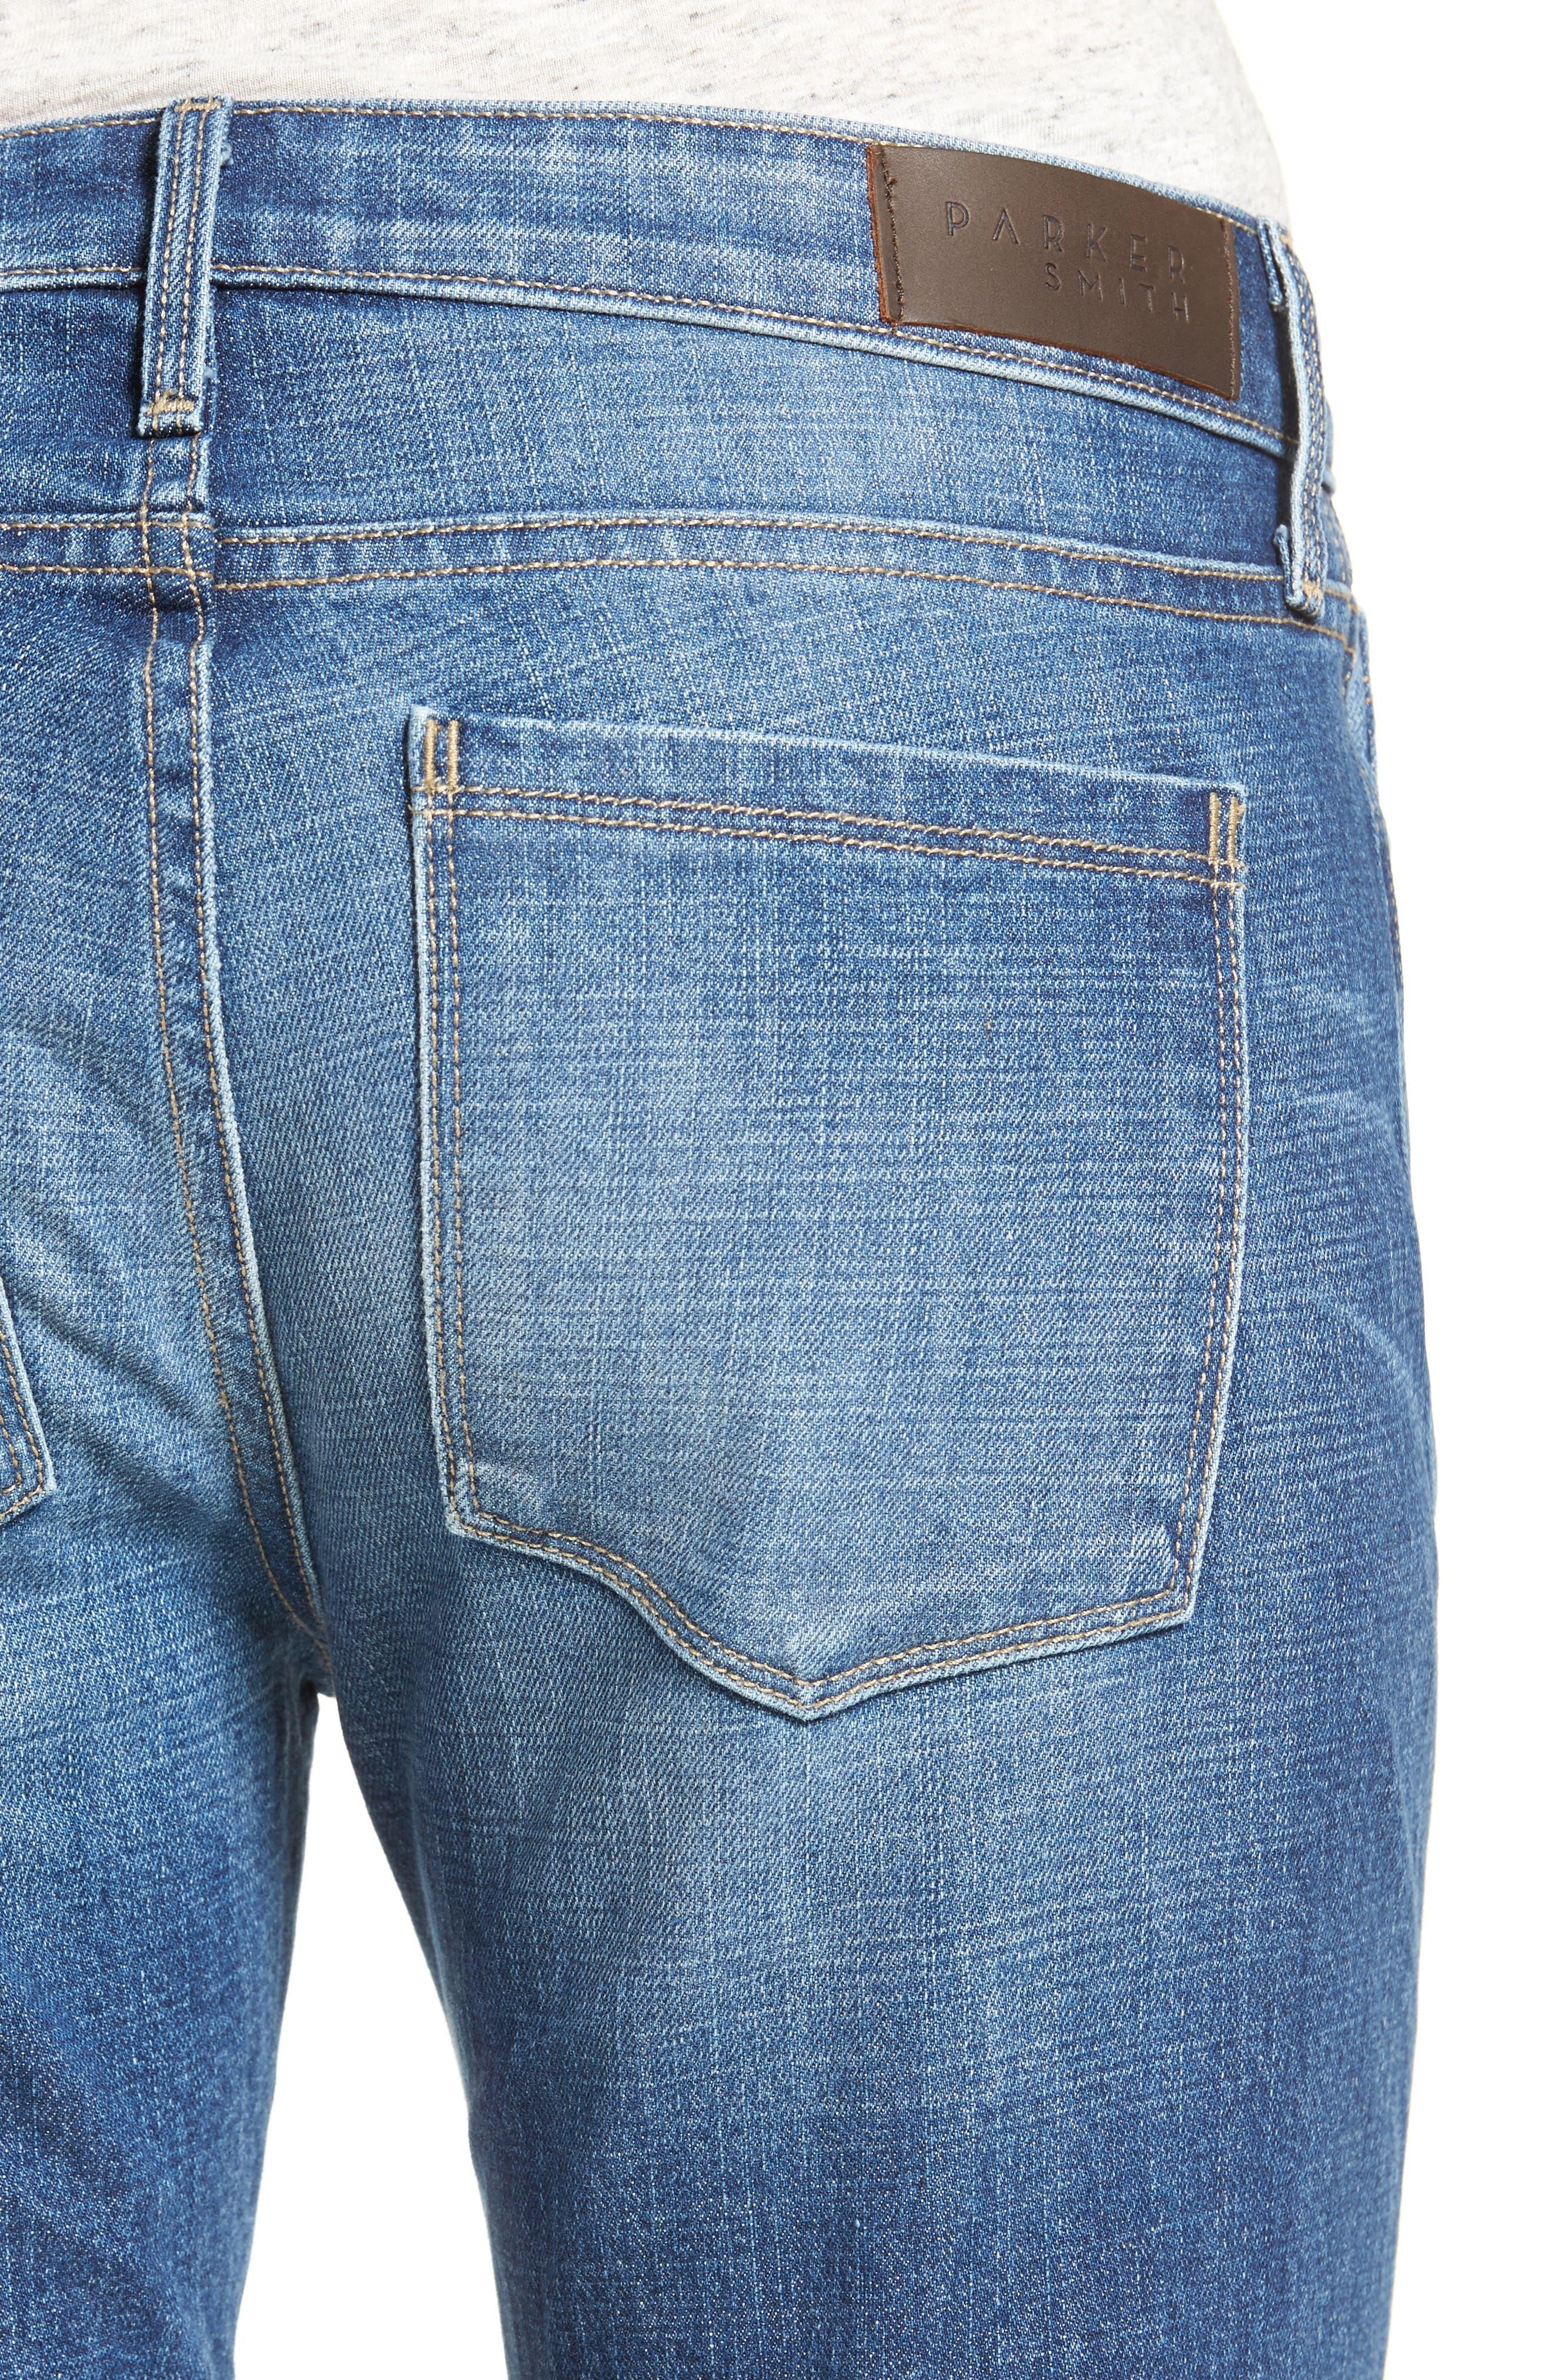 Vented Seam Straight Leg Jeans,                             Alternate thumbnail 4, color,                             483